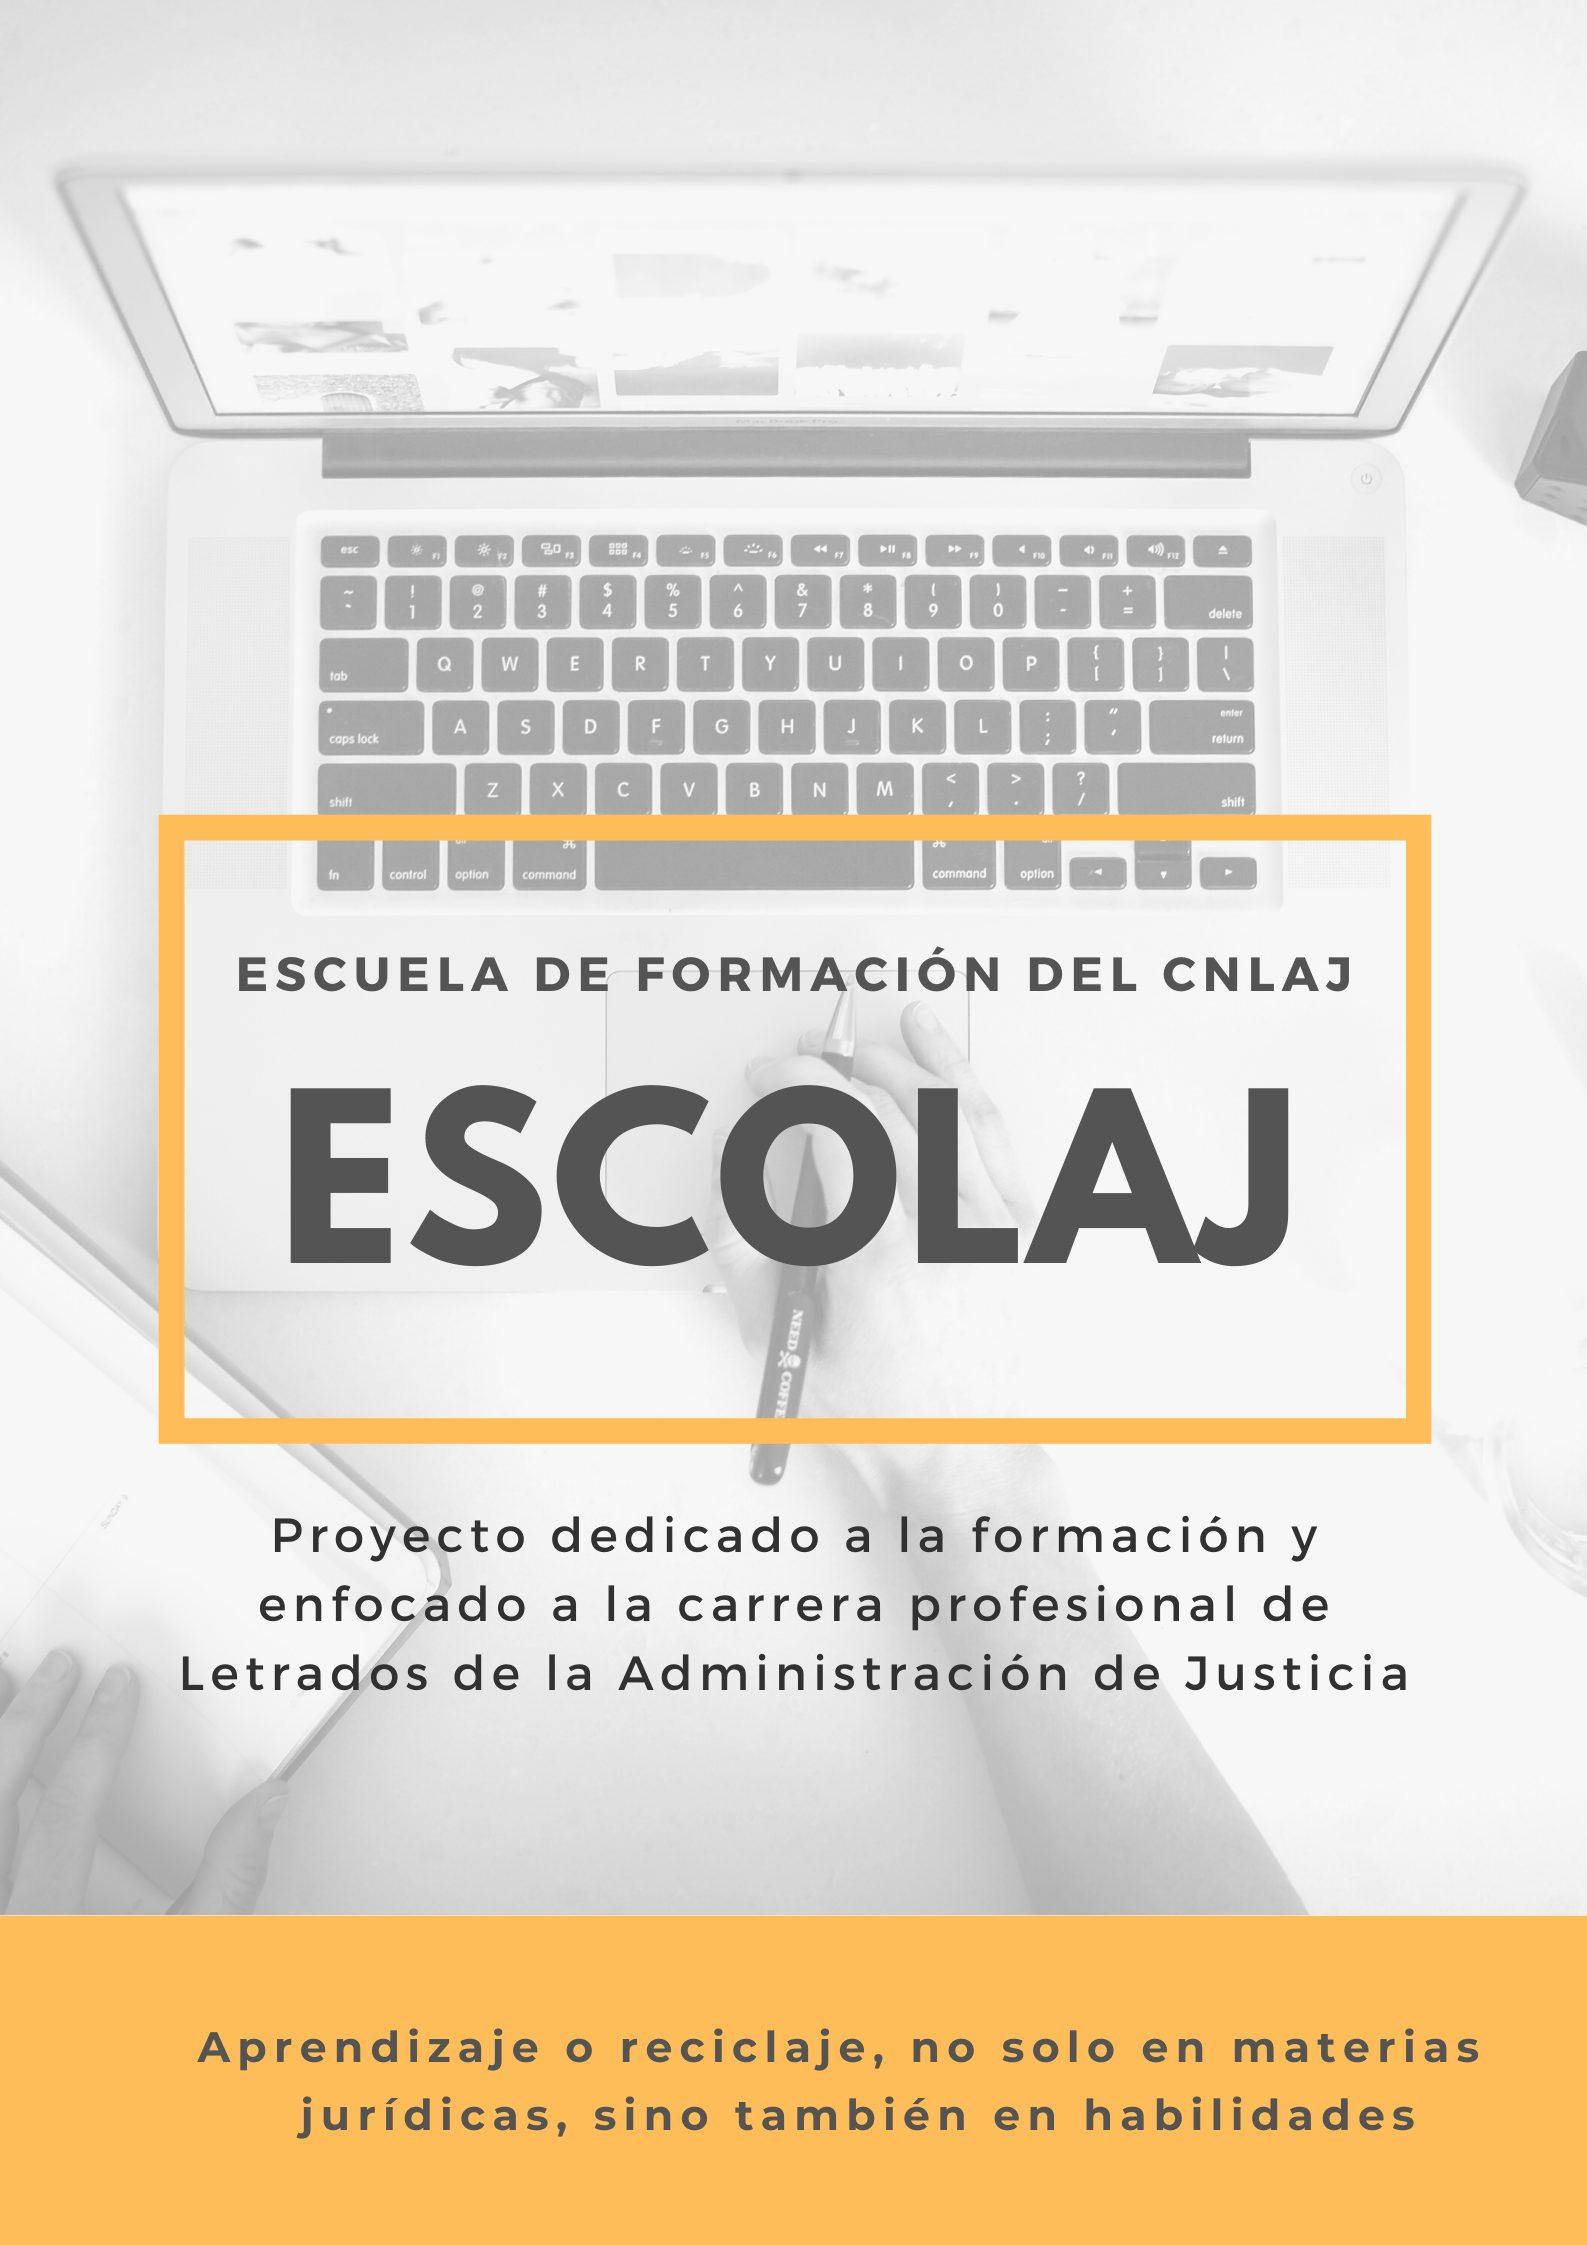 Escolaj Centro de formacion del CNLAJ